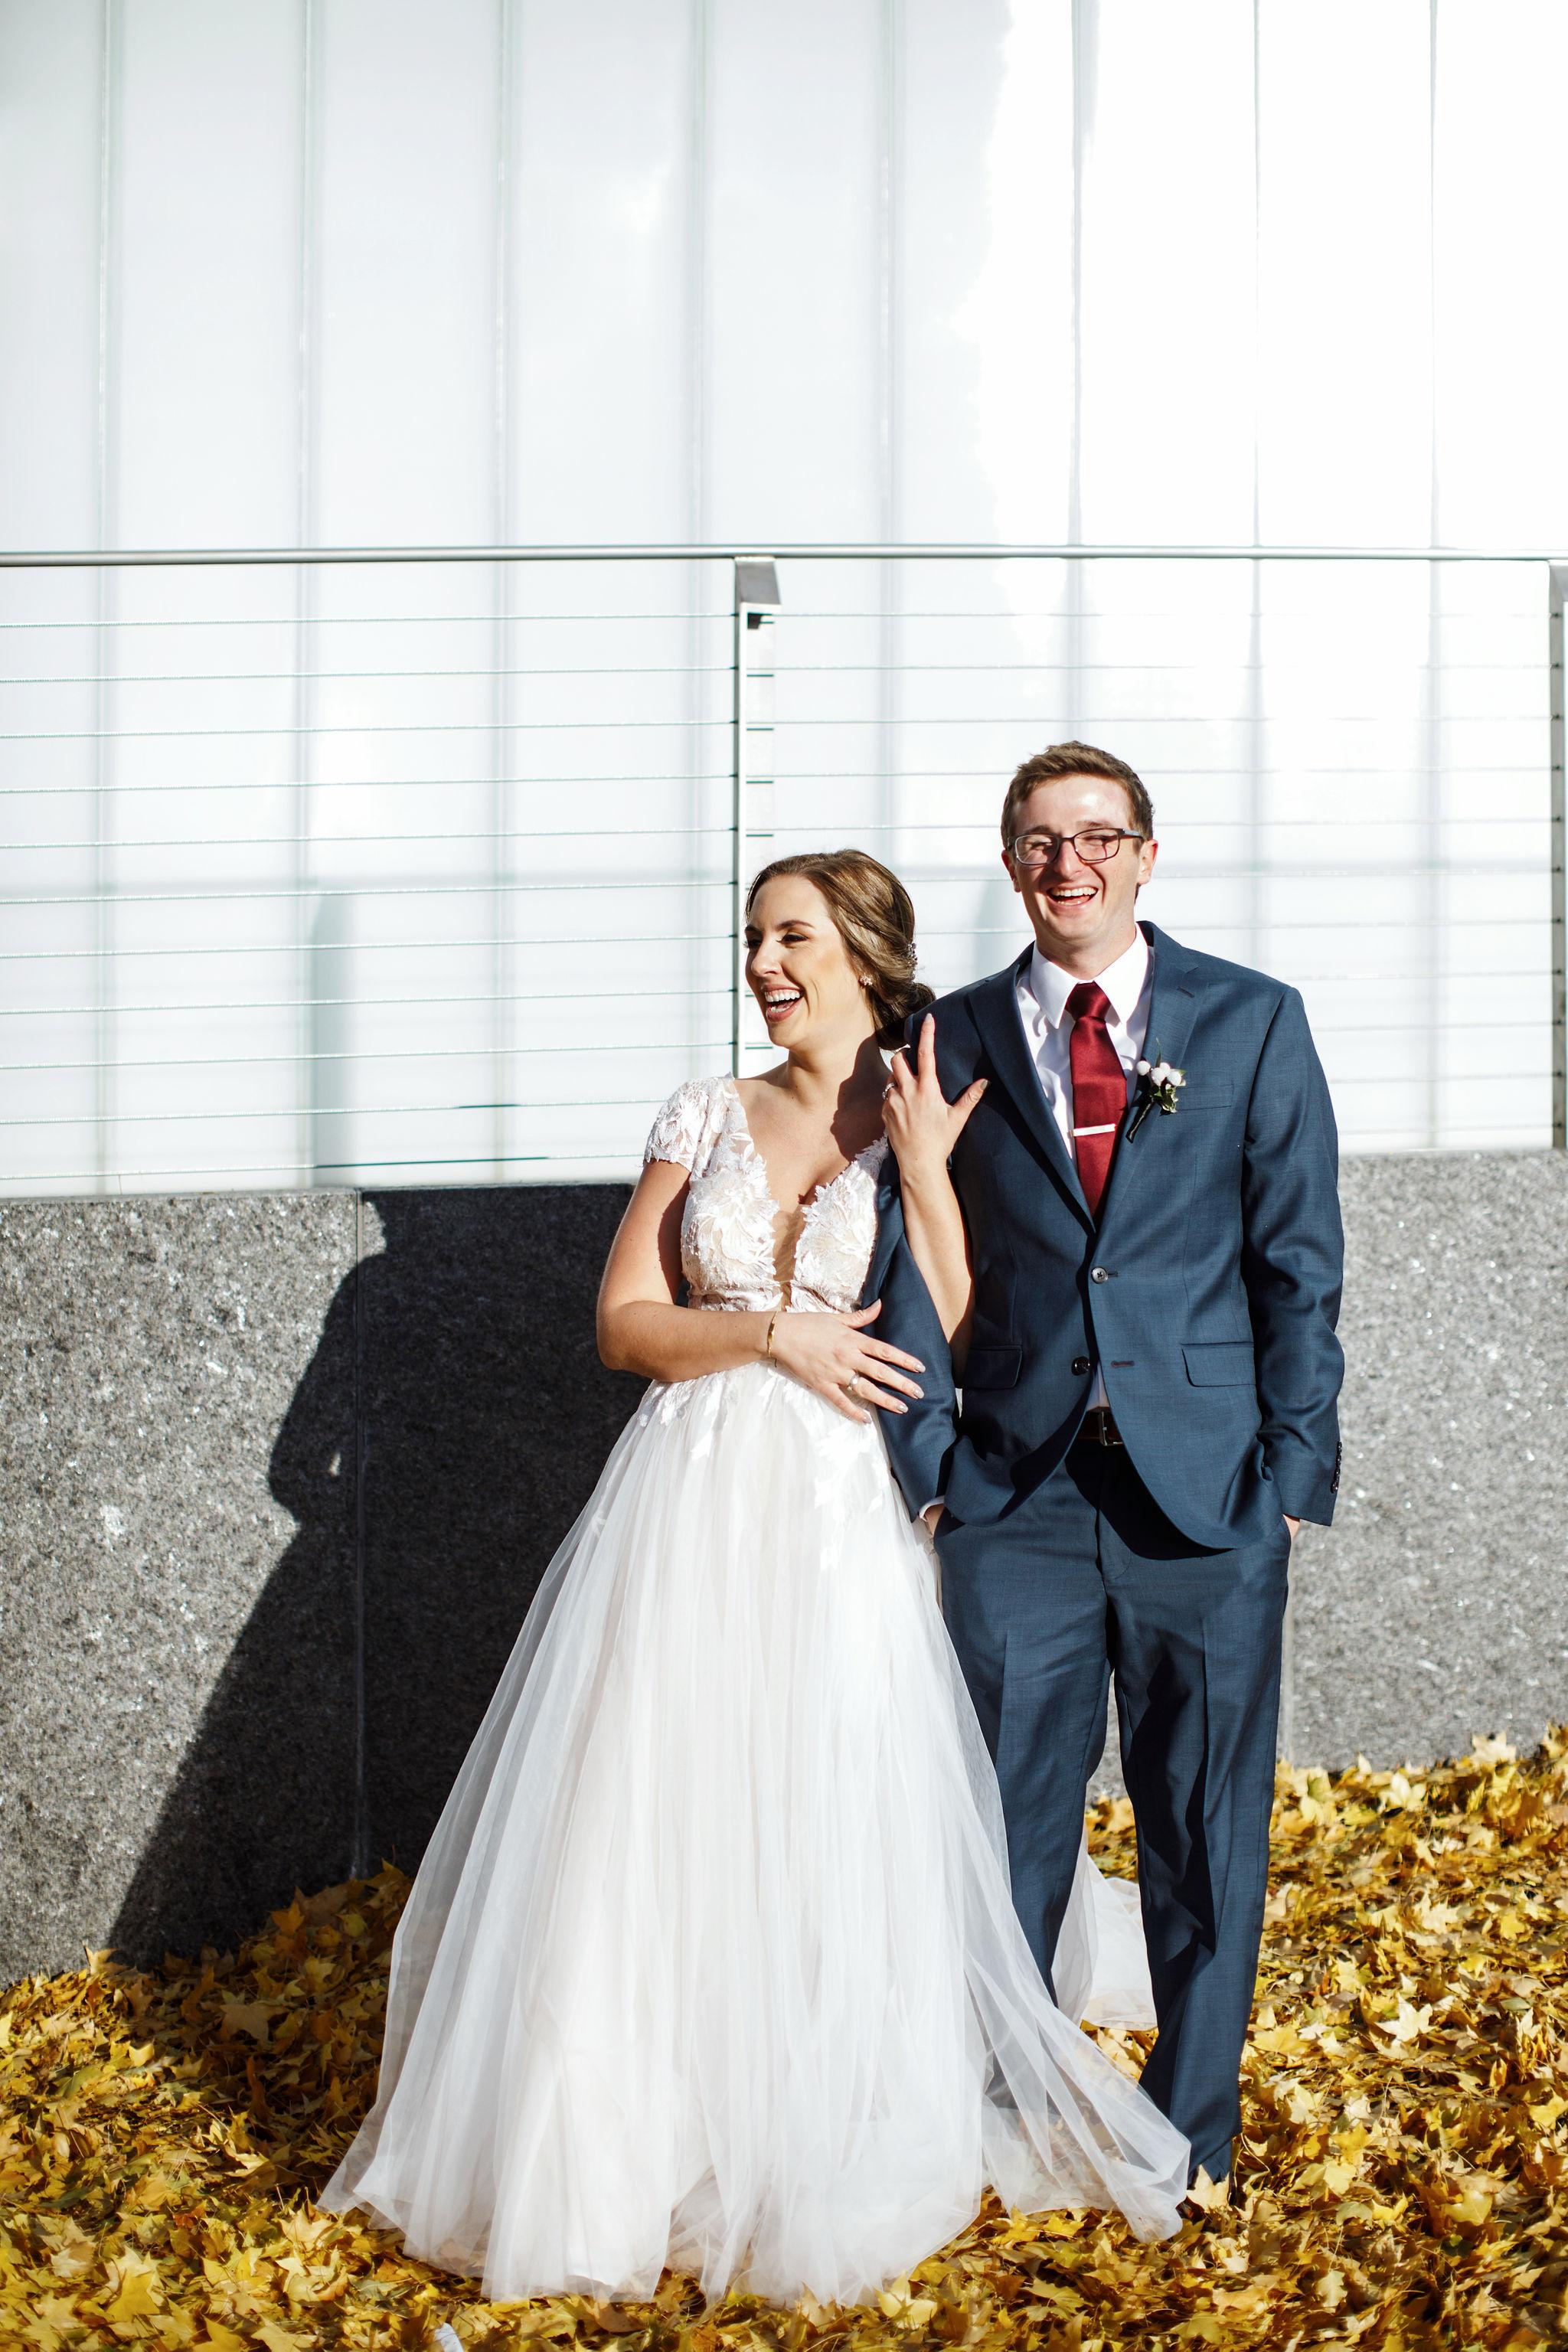 St. Francics Xavier and Madrid Theaater Wedding_Kindling Wedding Photography Kansas City_03.JPG